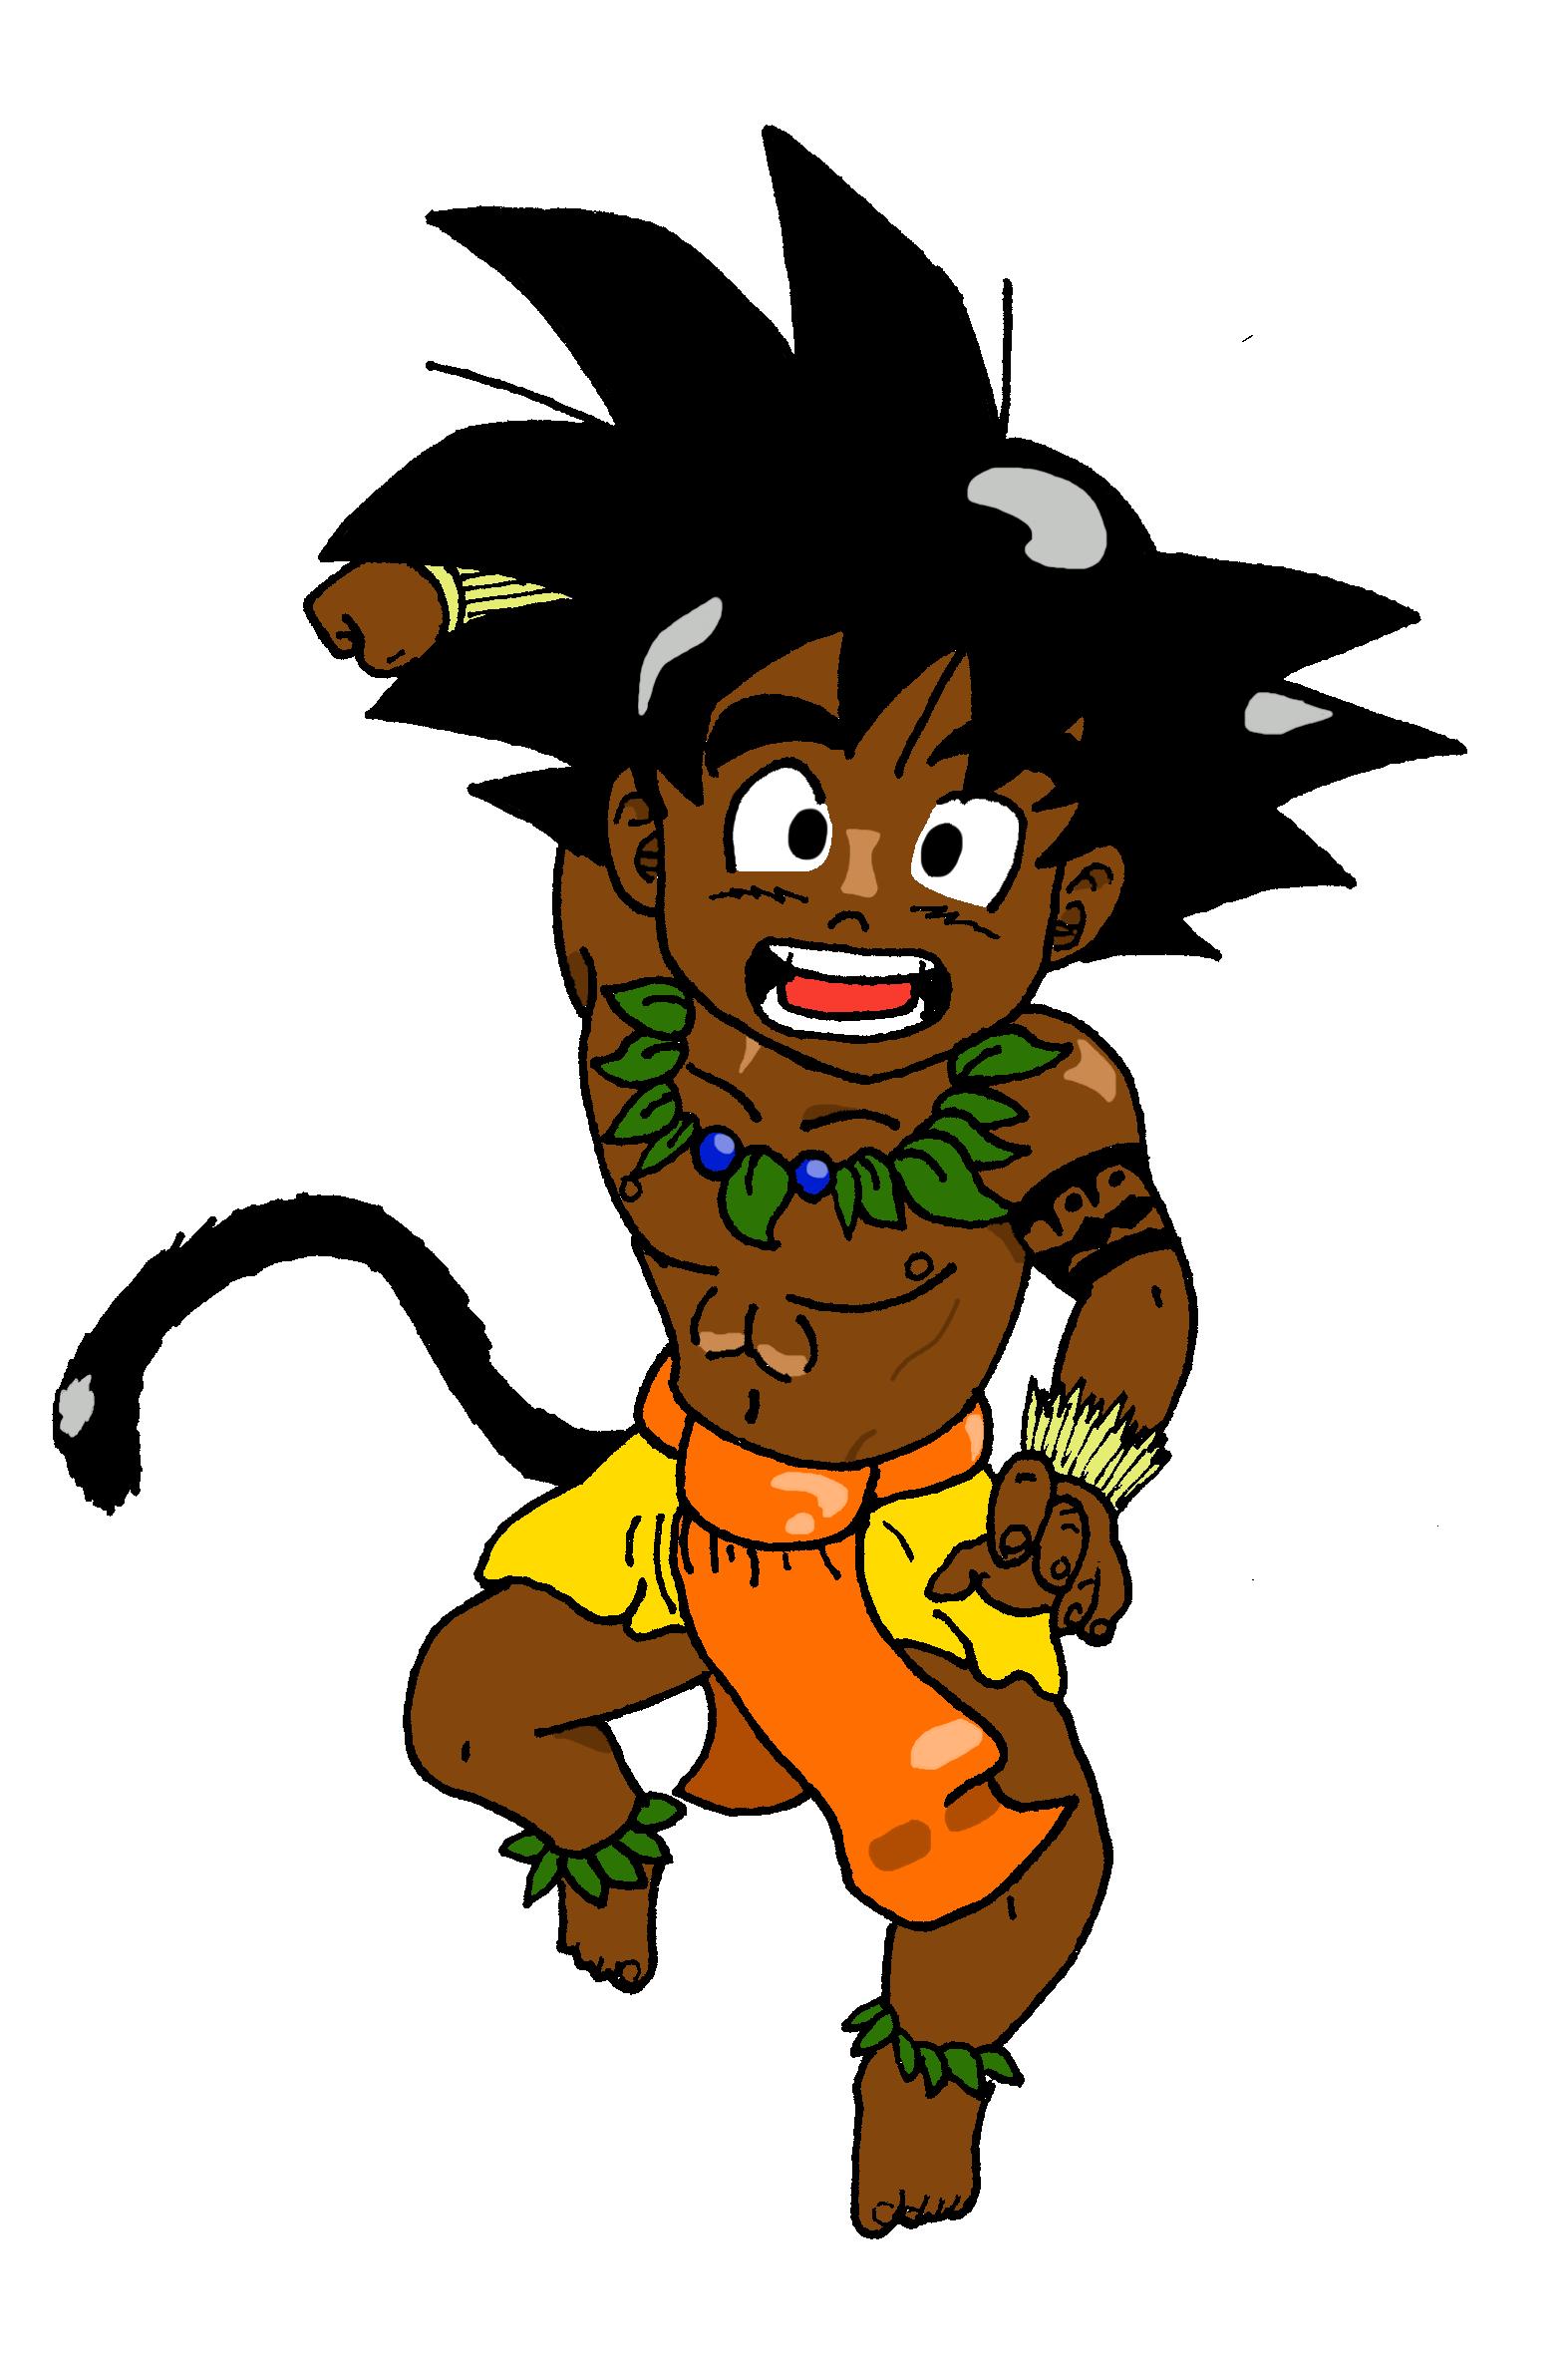 Ra makimaki mo o. Warrior clipart polynesian